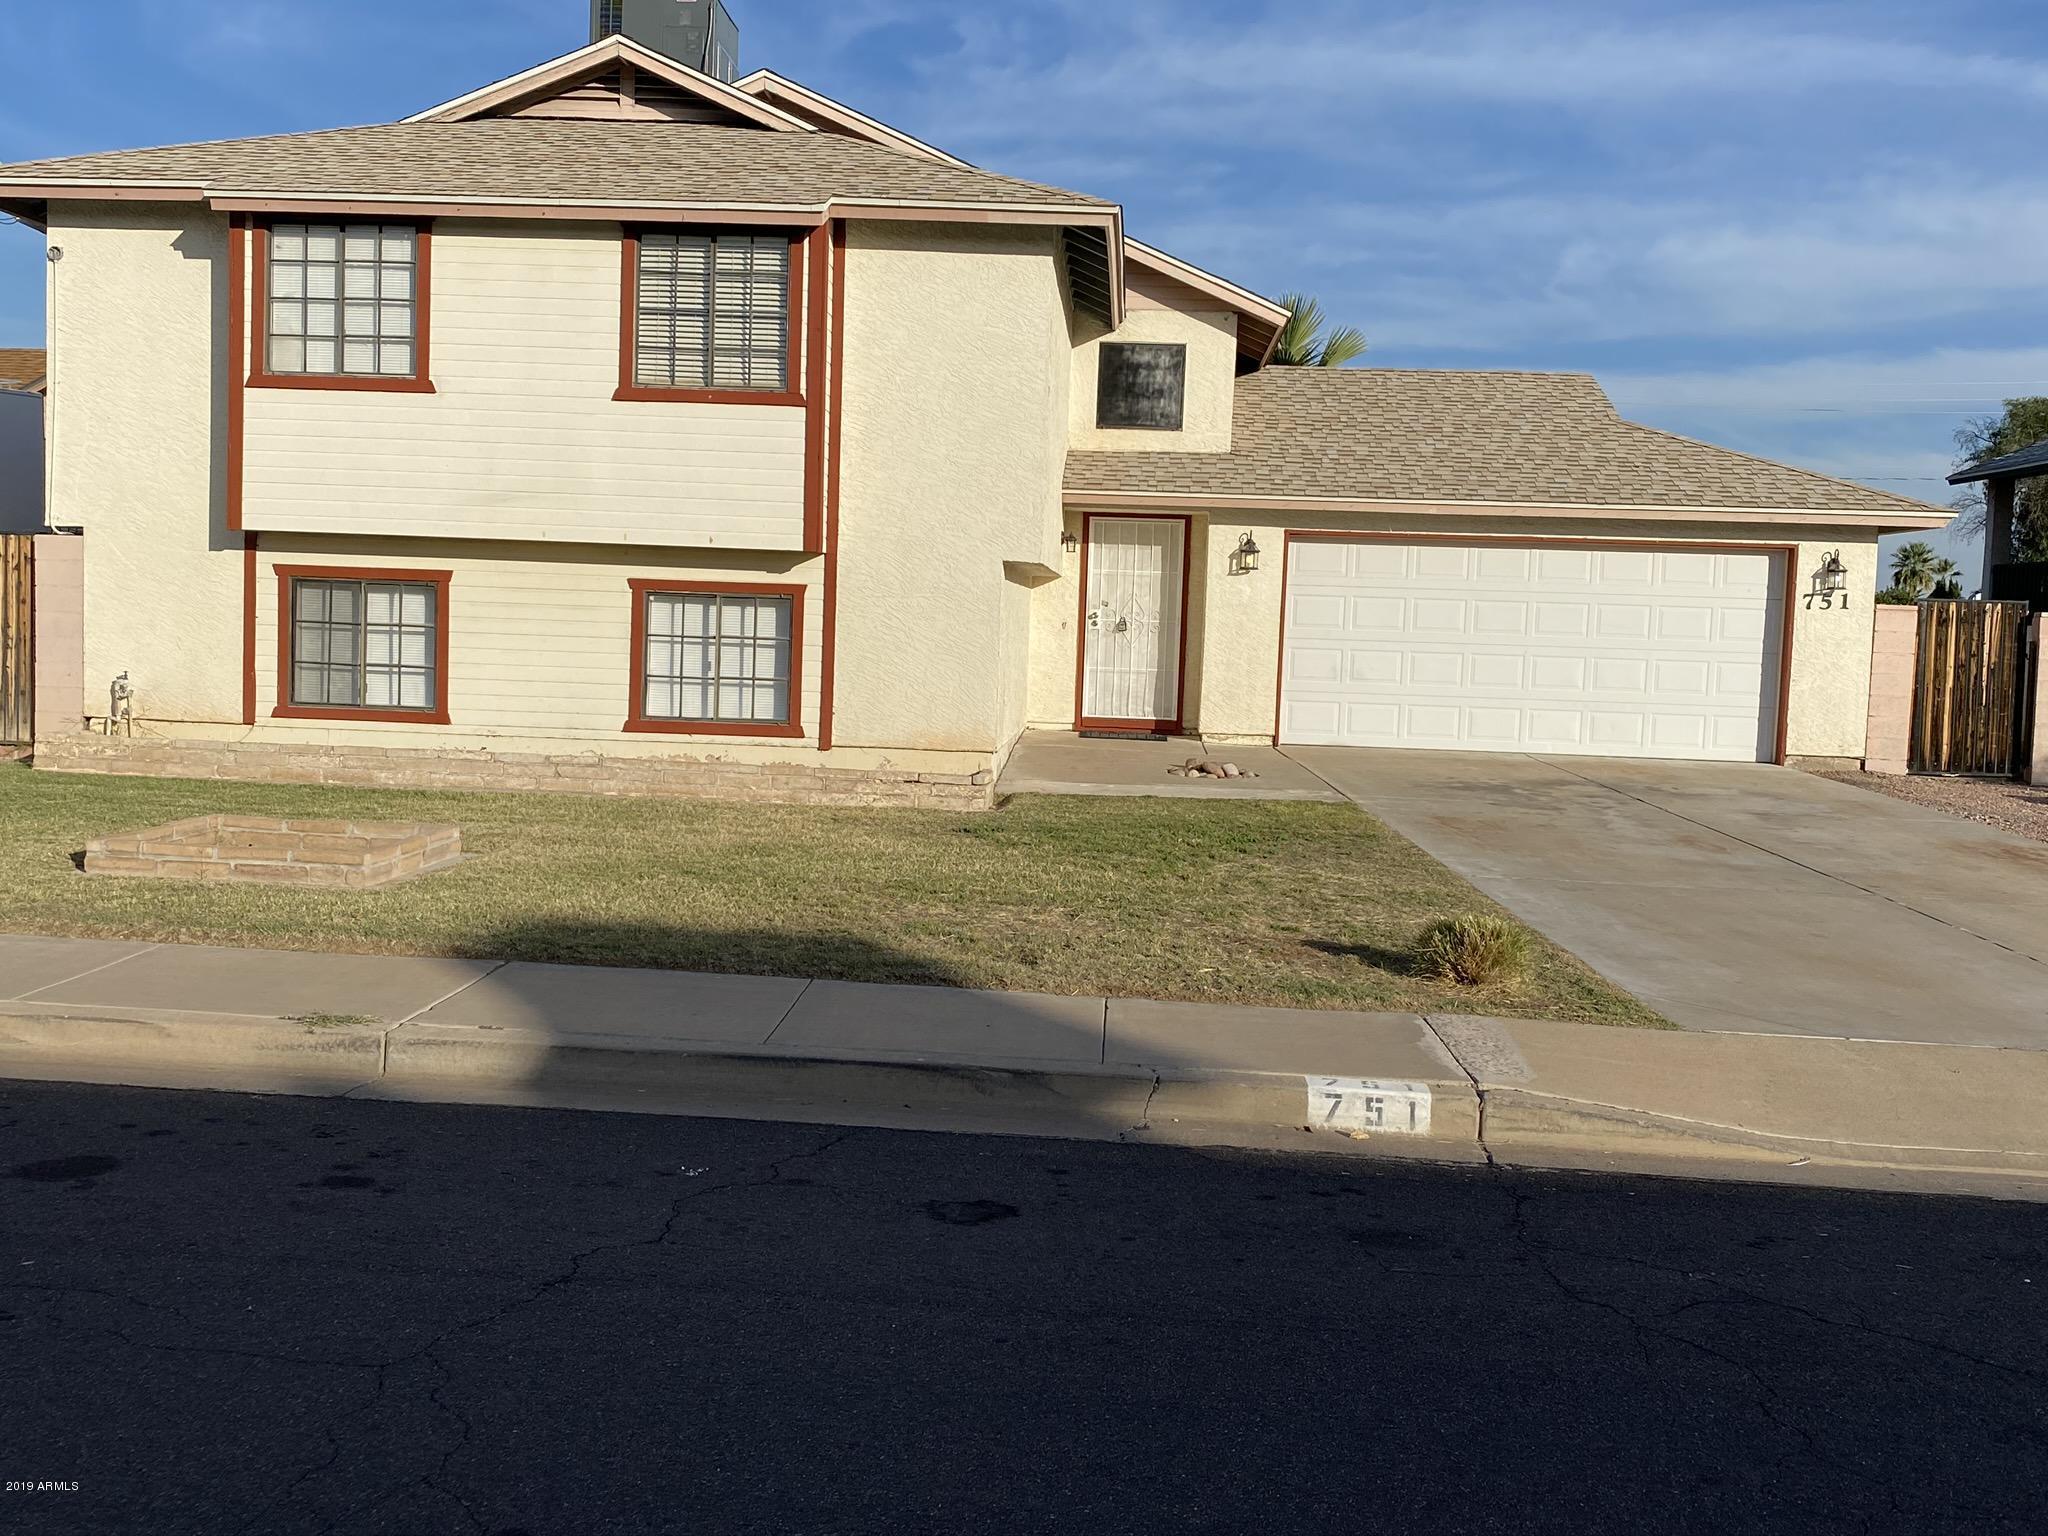 Photo of 751 N BALBOA Circle, Mesa, AZ 85205